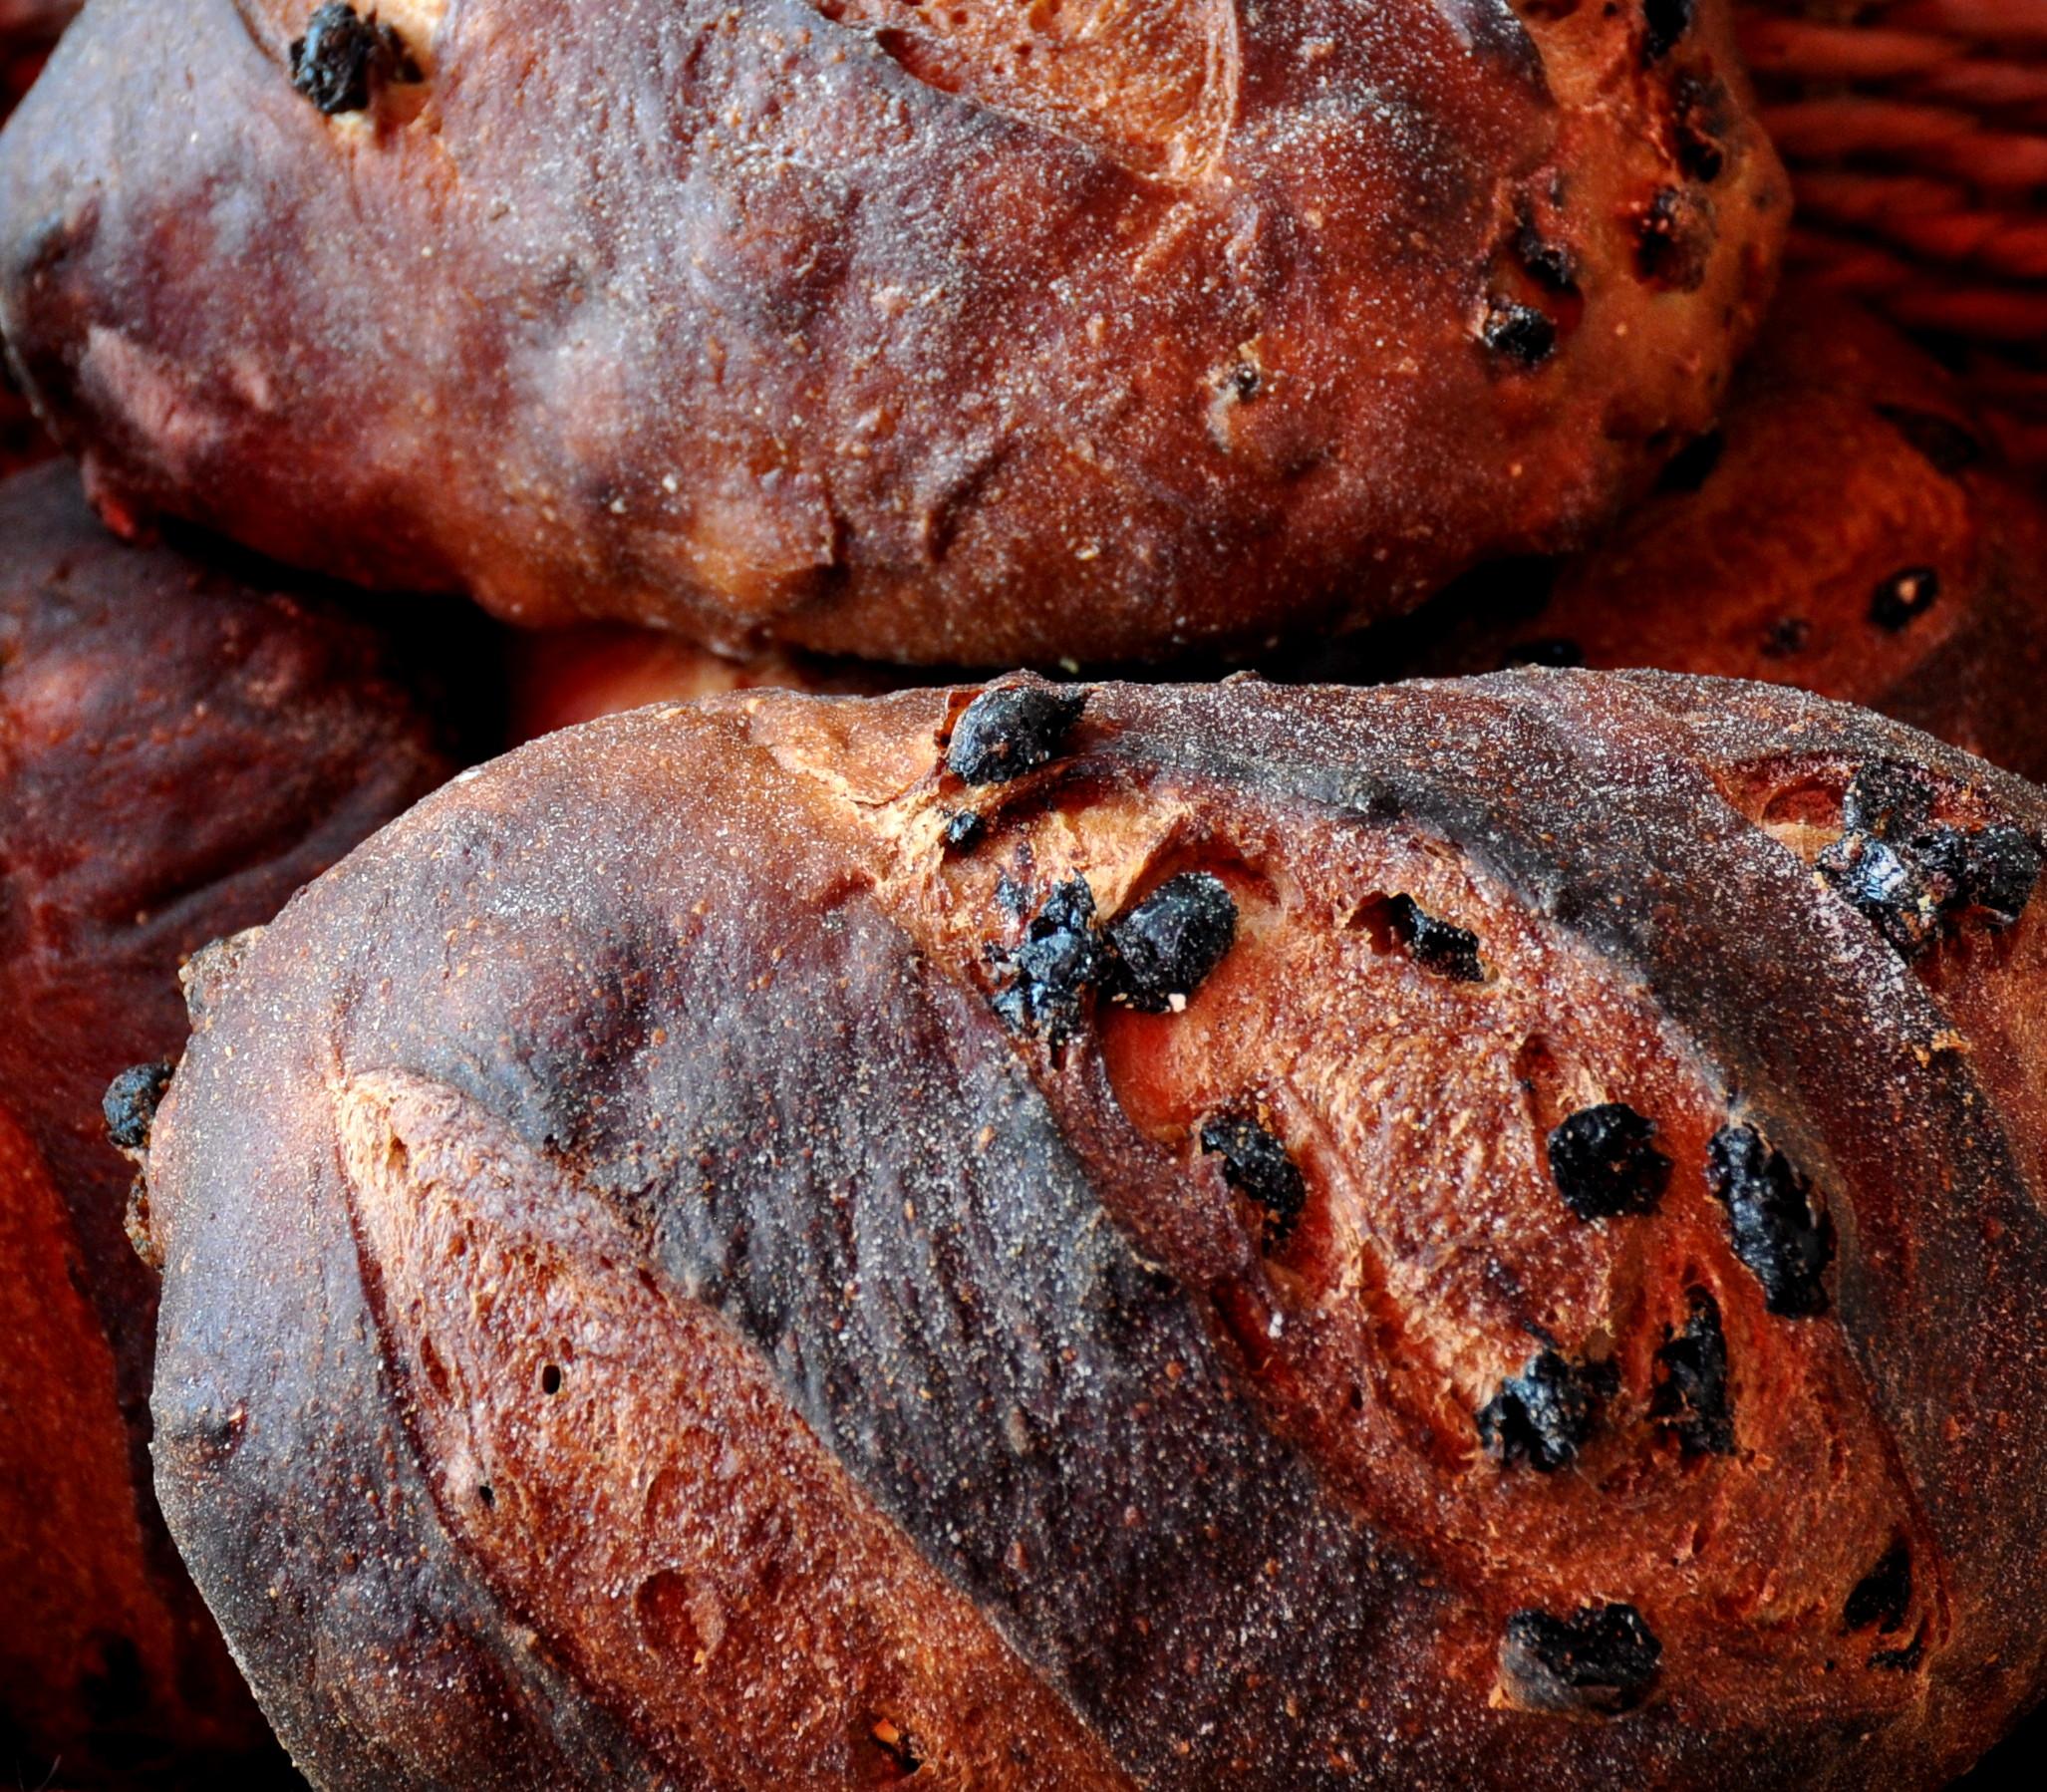 Raisin pumpernickel bread from Snohomish Bakery at Wallingford Farmers Market. Copyright Zachary D. Lyons.